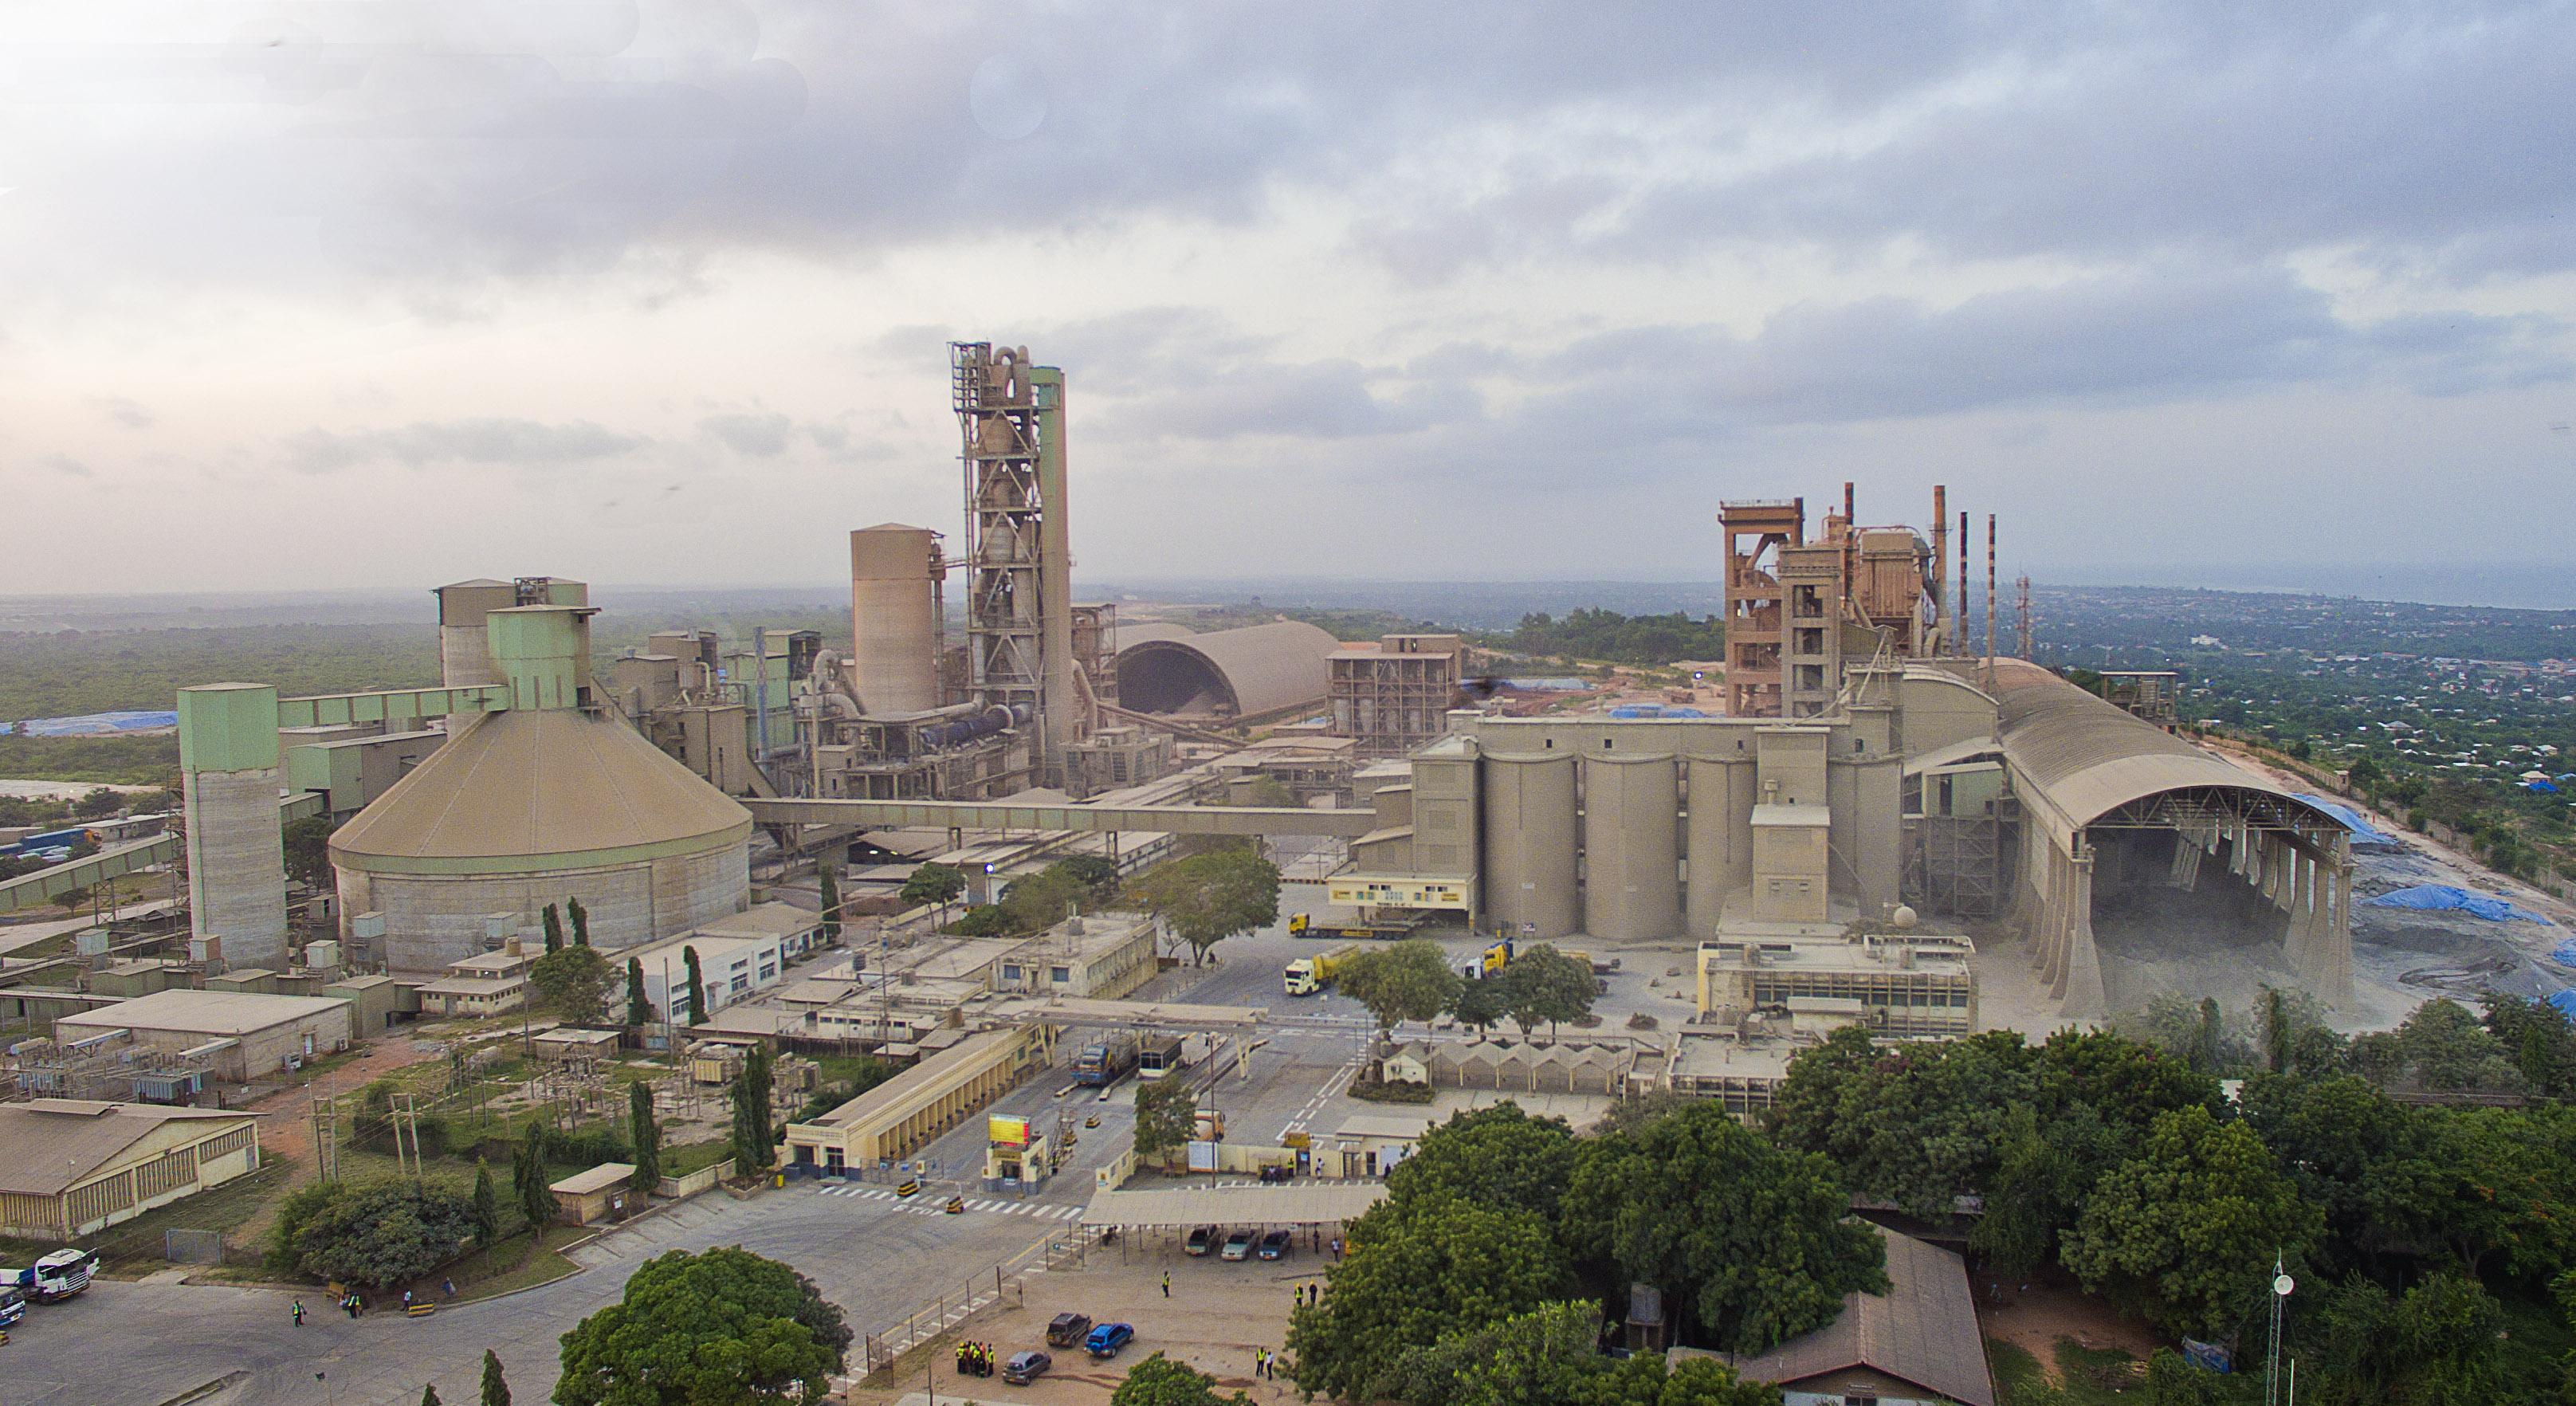 Welcome to Tanzania Portland Cement Public Limited Company